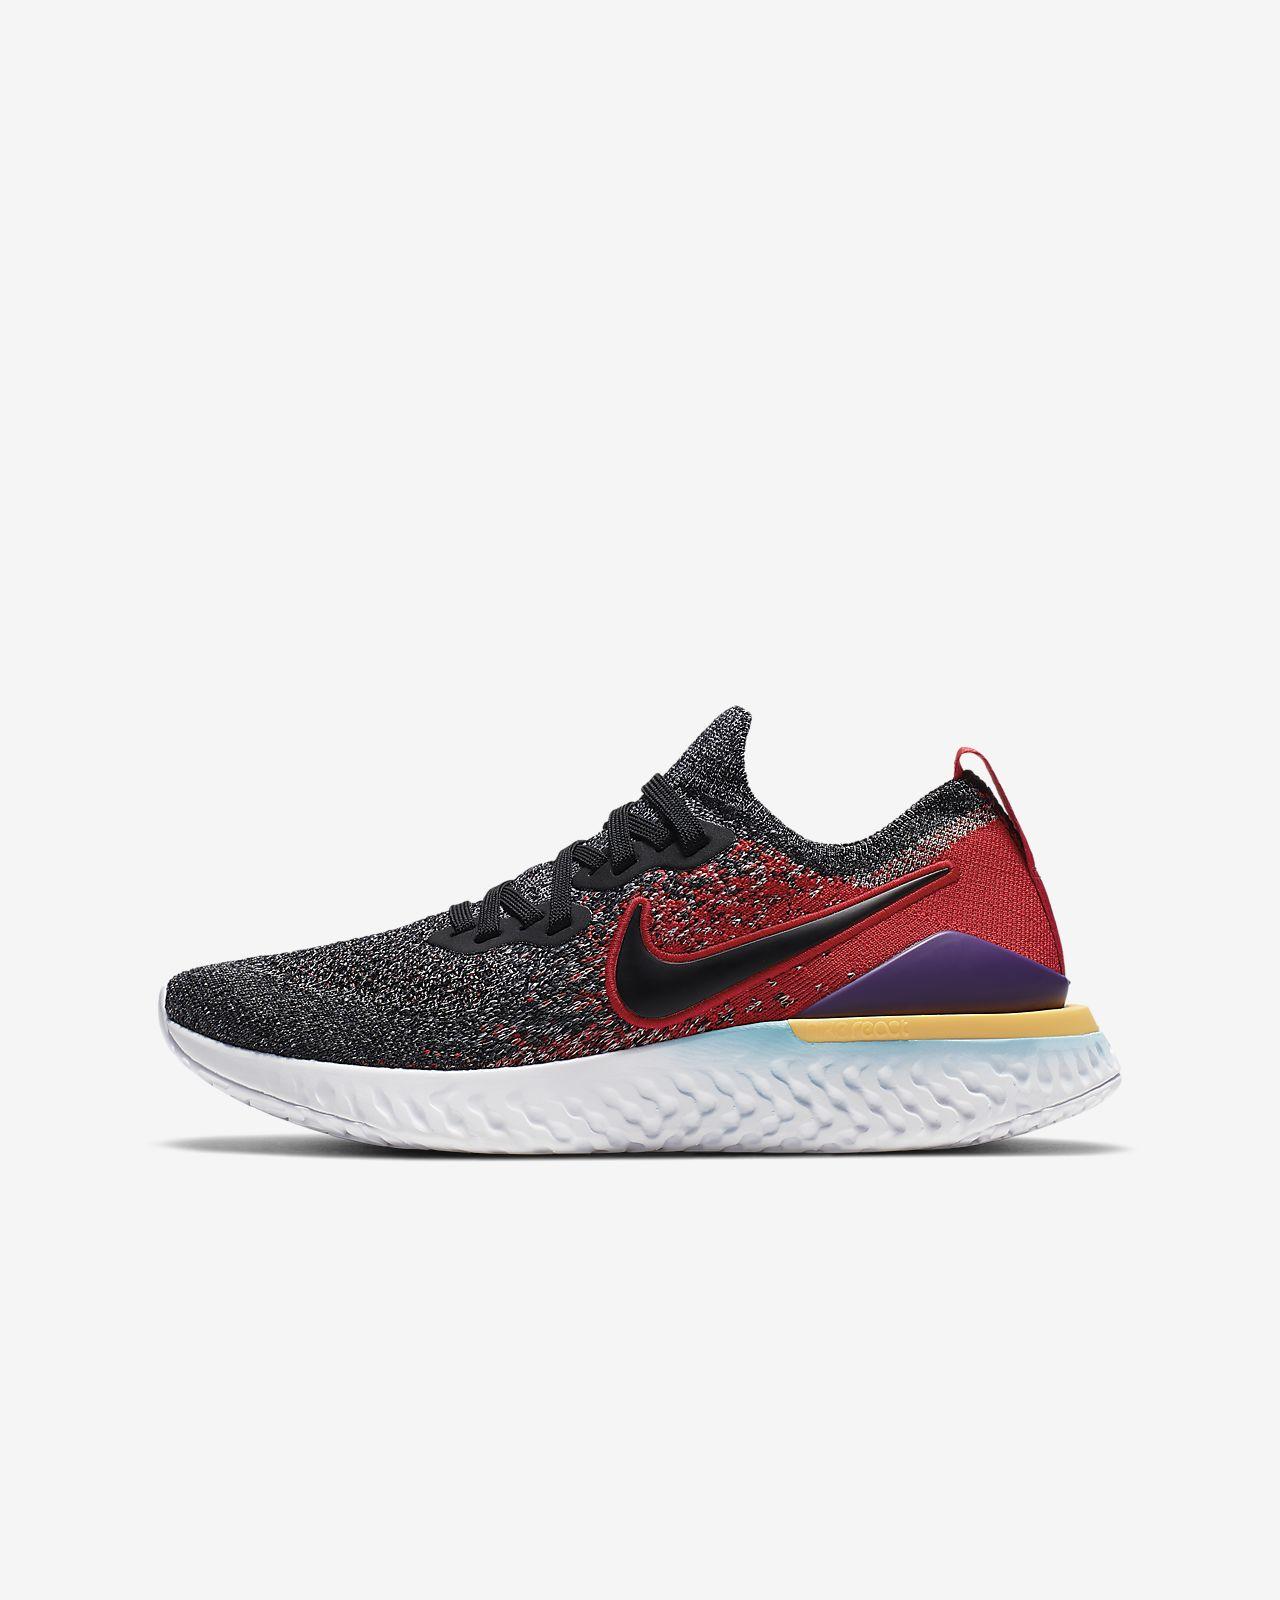 Löparsko Nike Epic React Flyknit 2 för ungdom